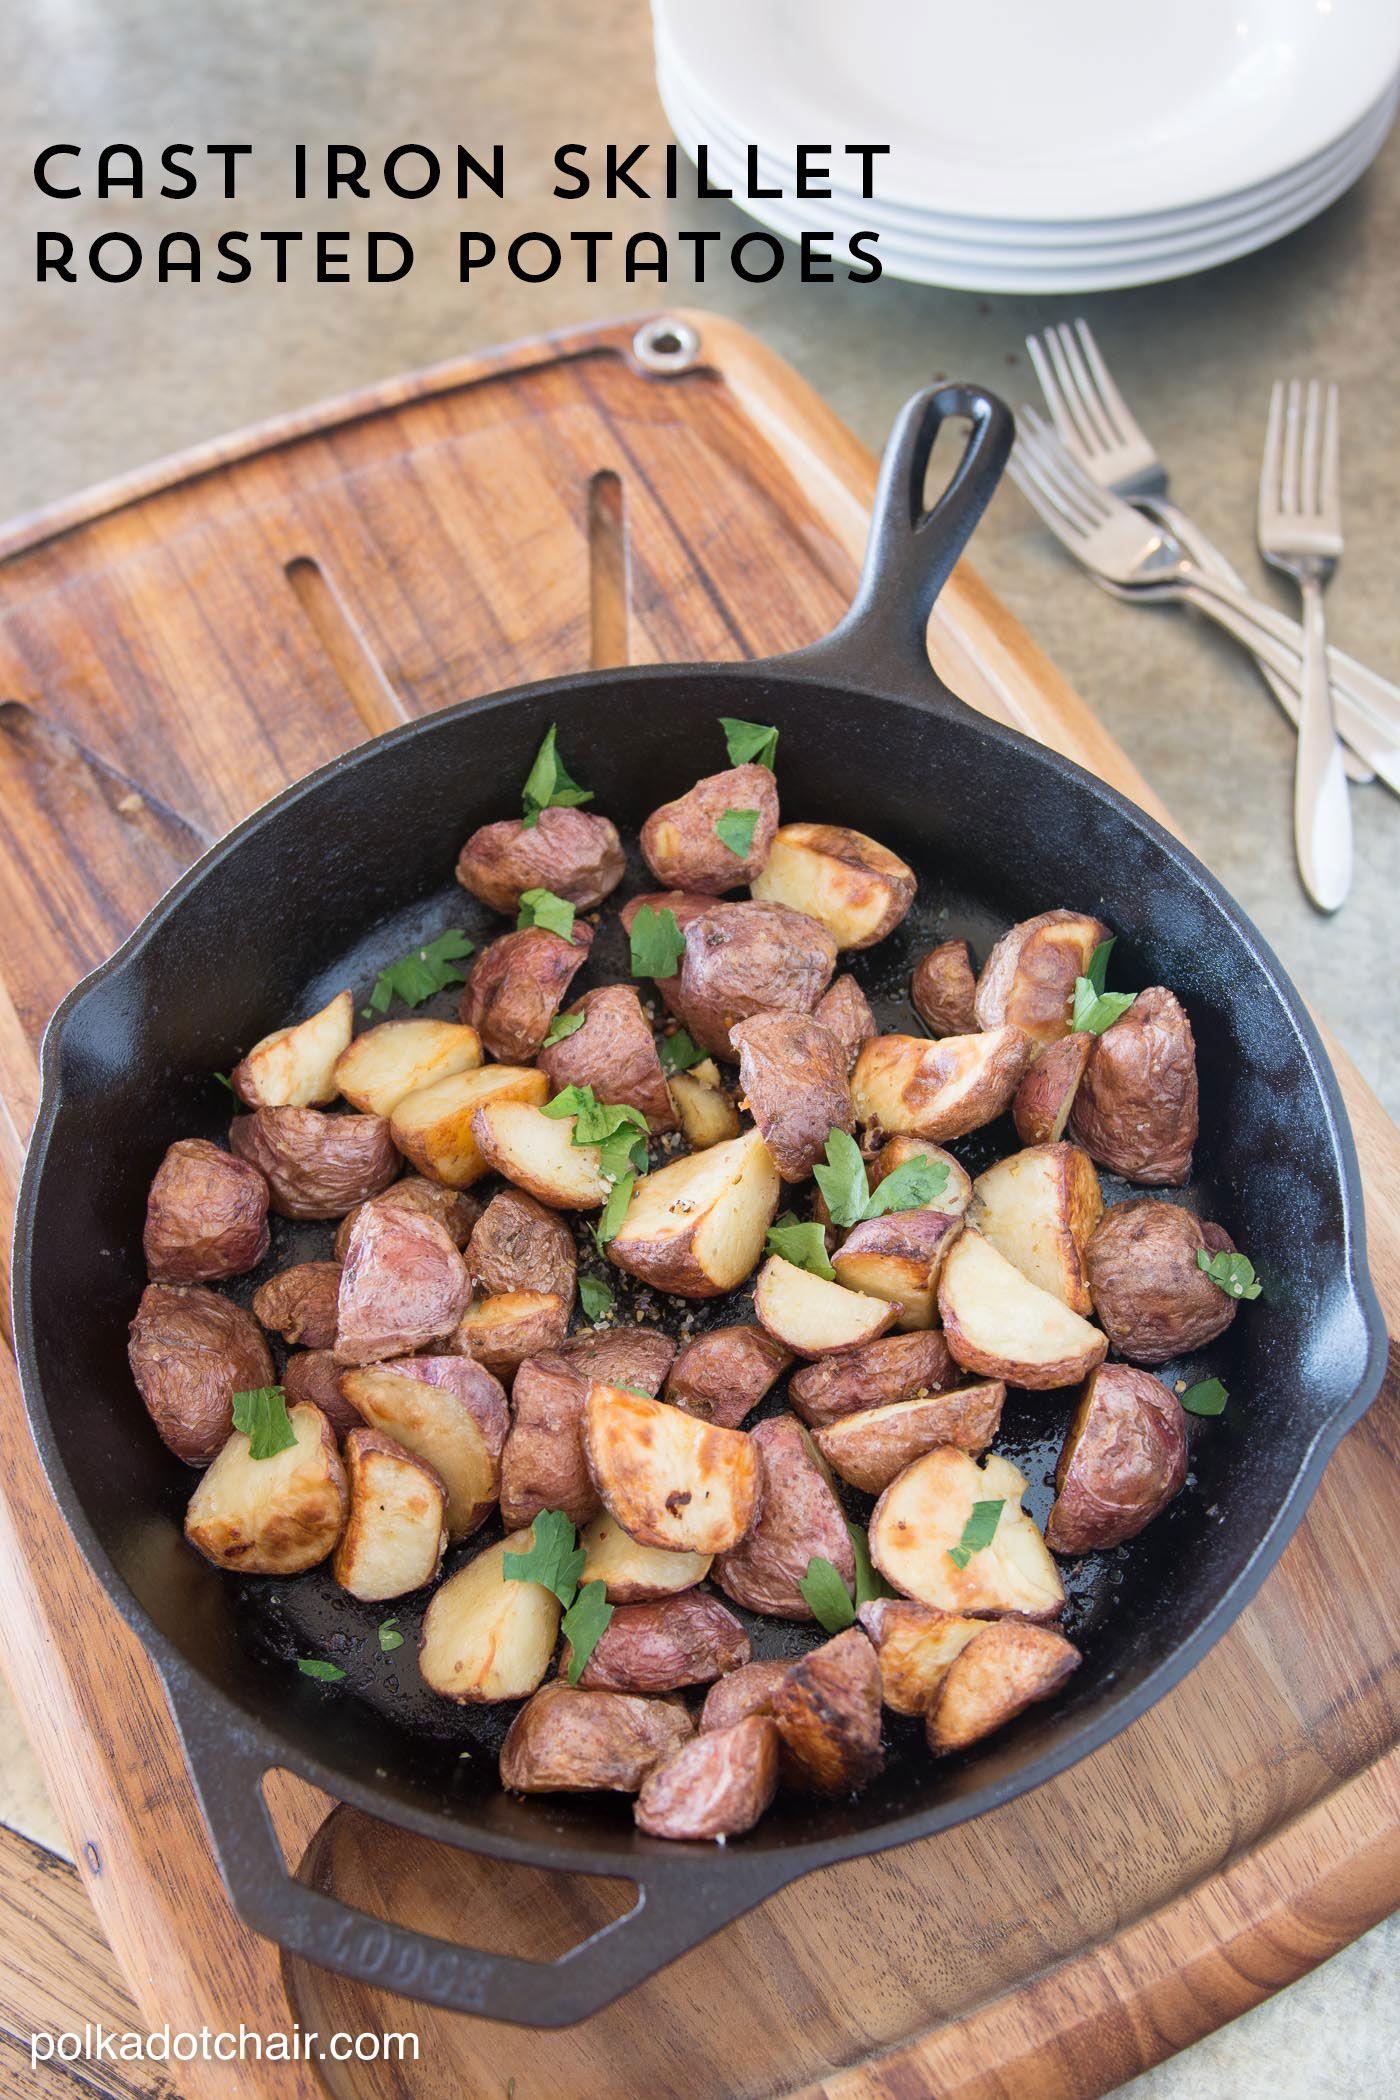 Cast Iron Skillet Roasted Potatoes